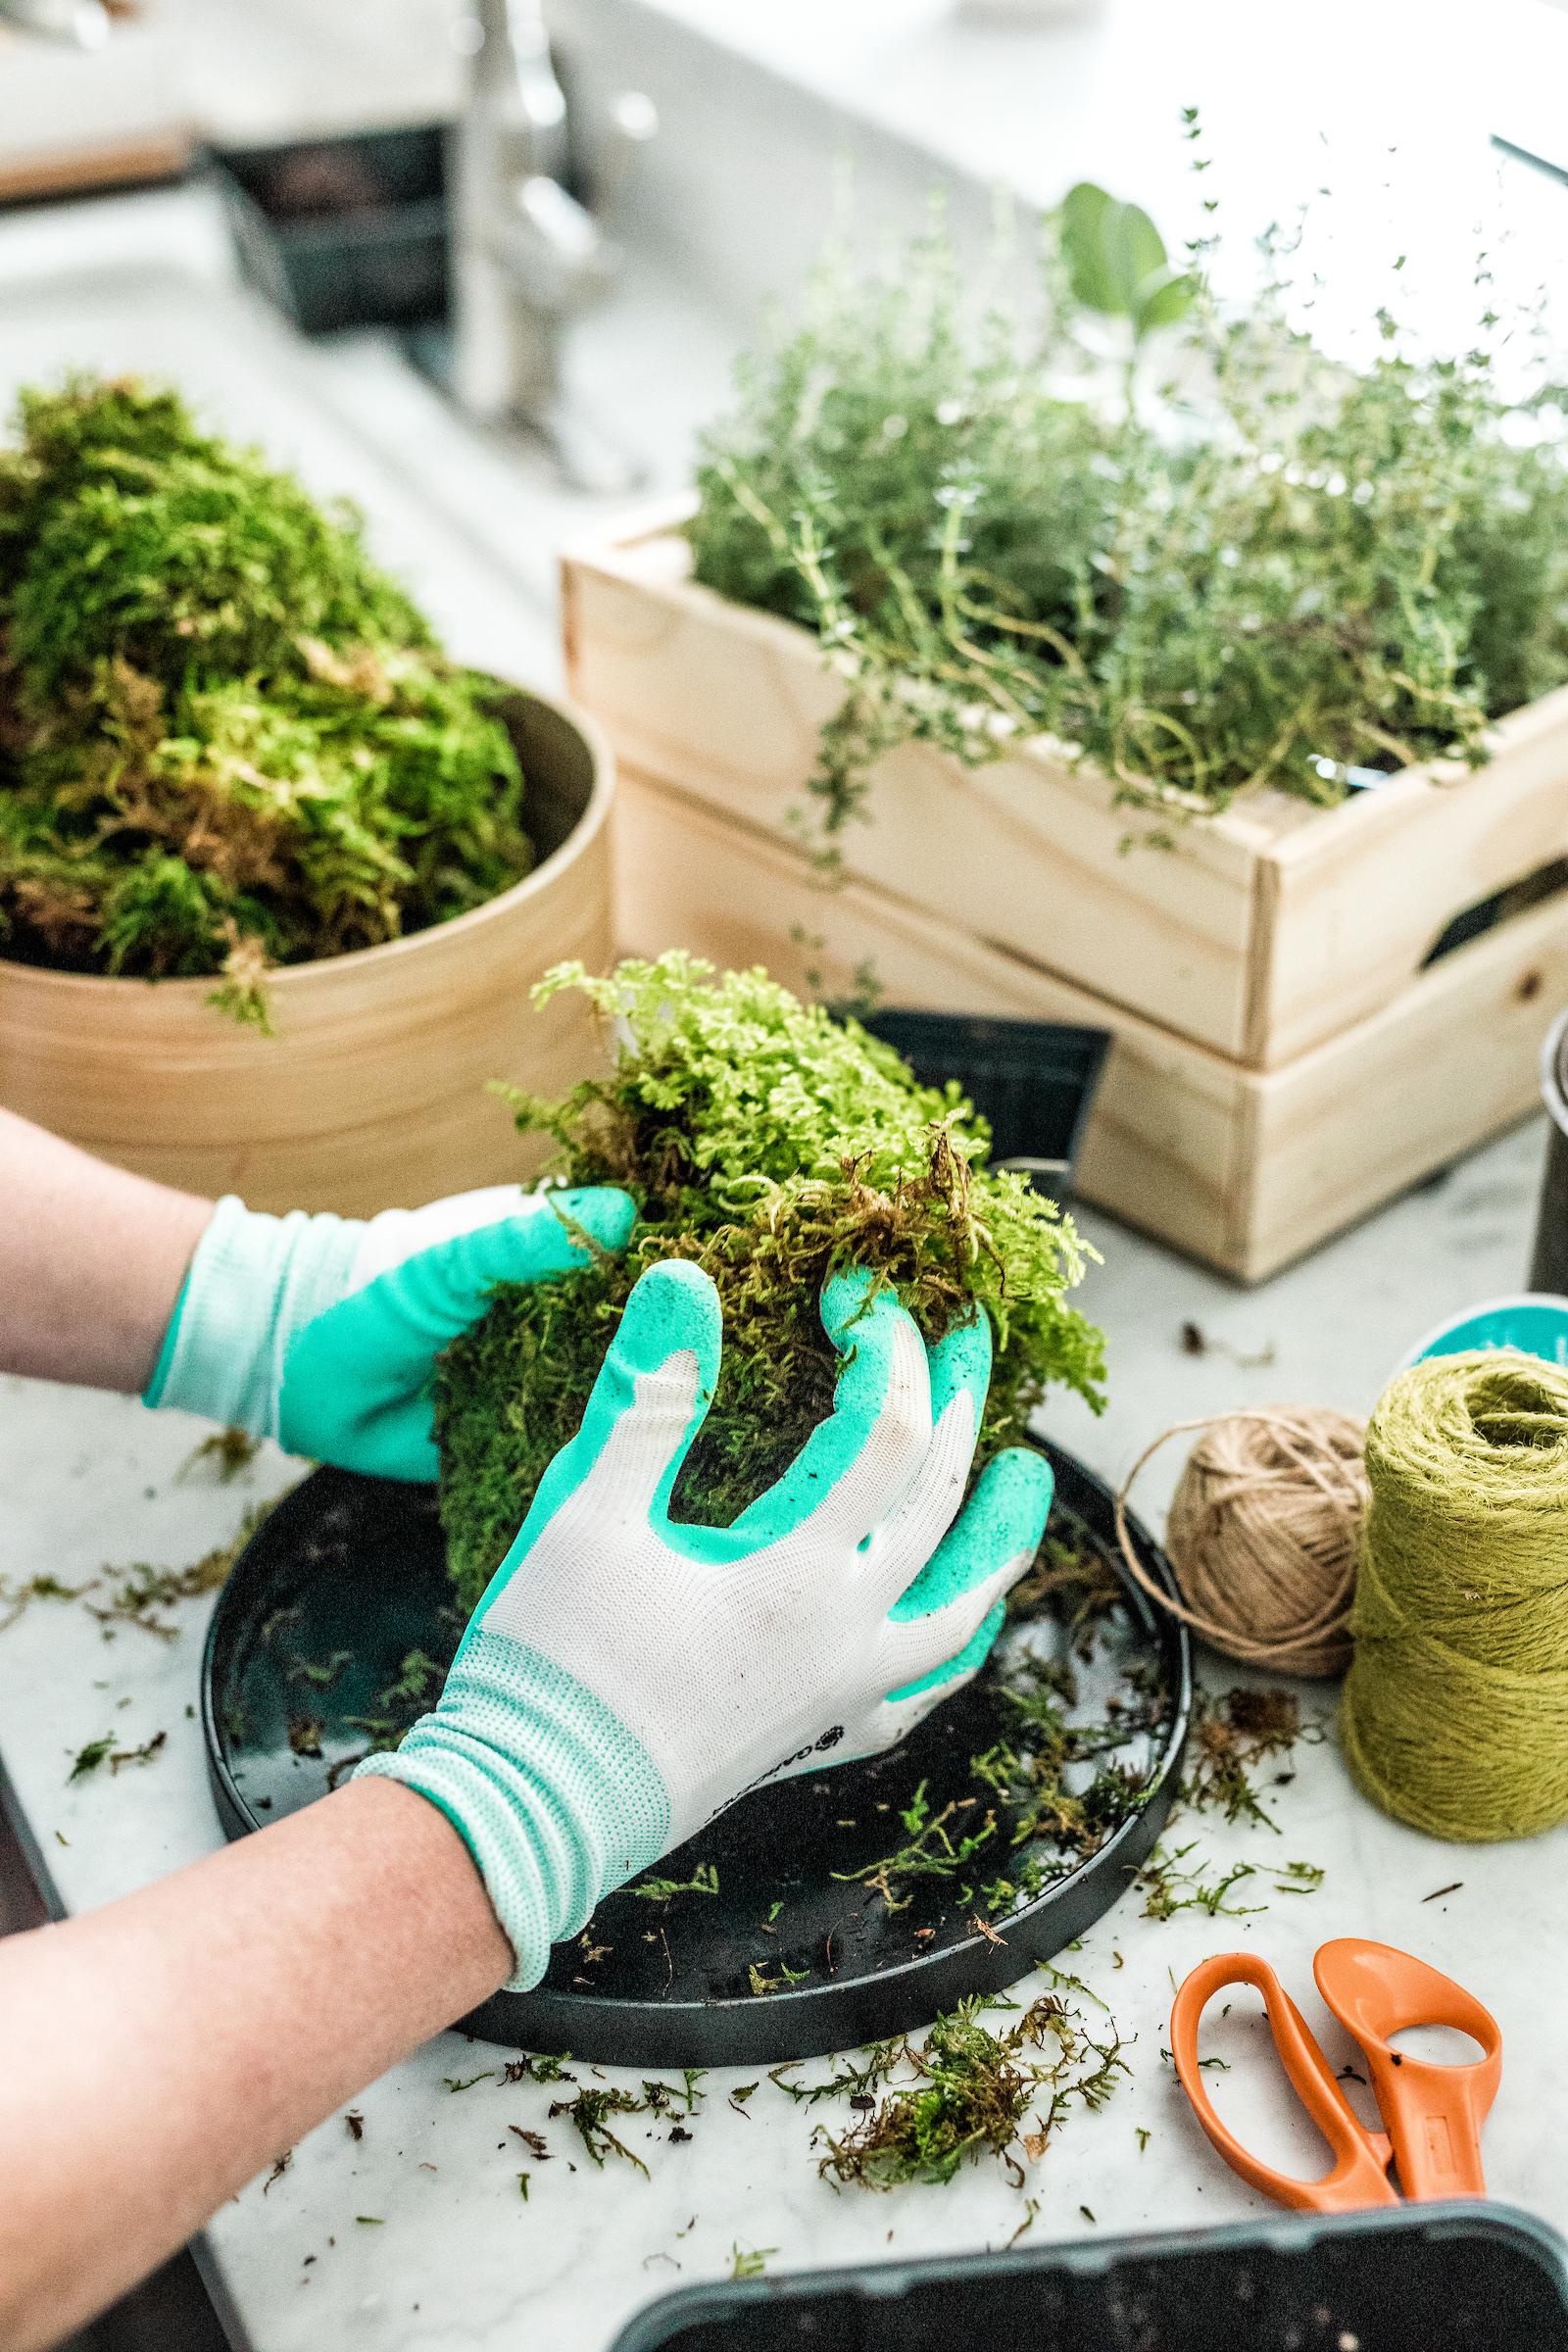 Wrap moss around the soil sphere.